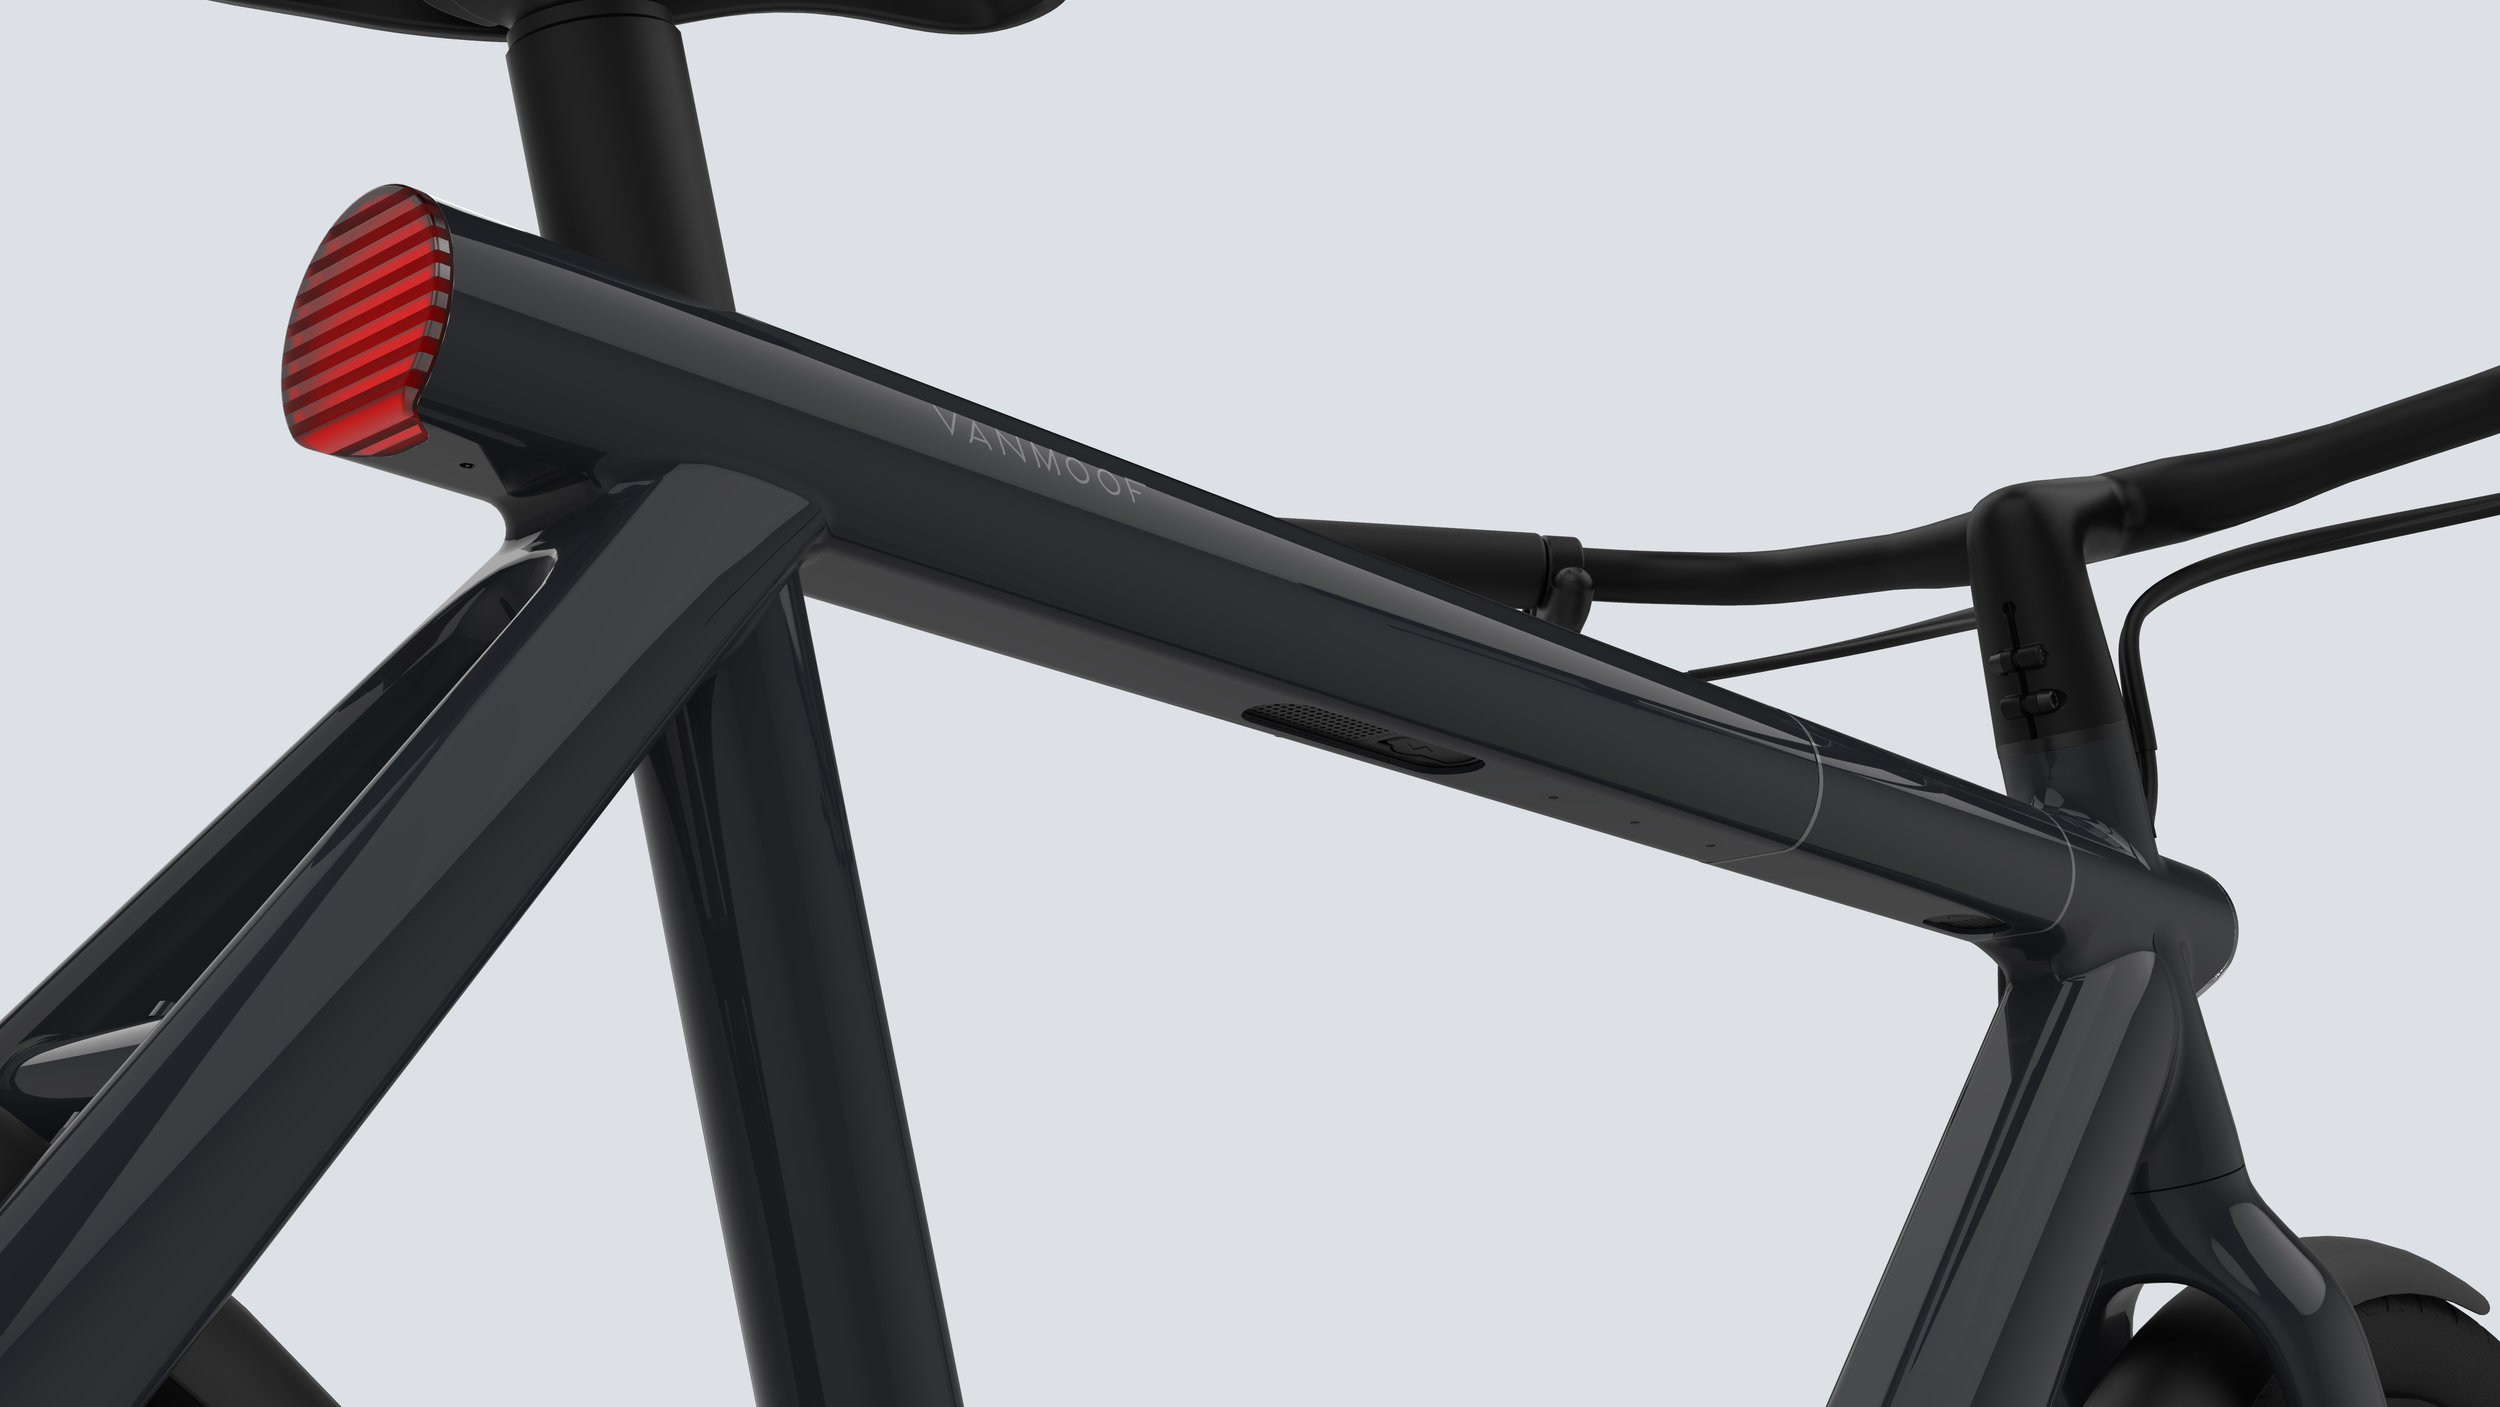 VanMoof's Futuristic Anti-Theft Electrified Bikes — LivingIQ